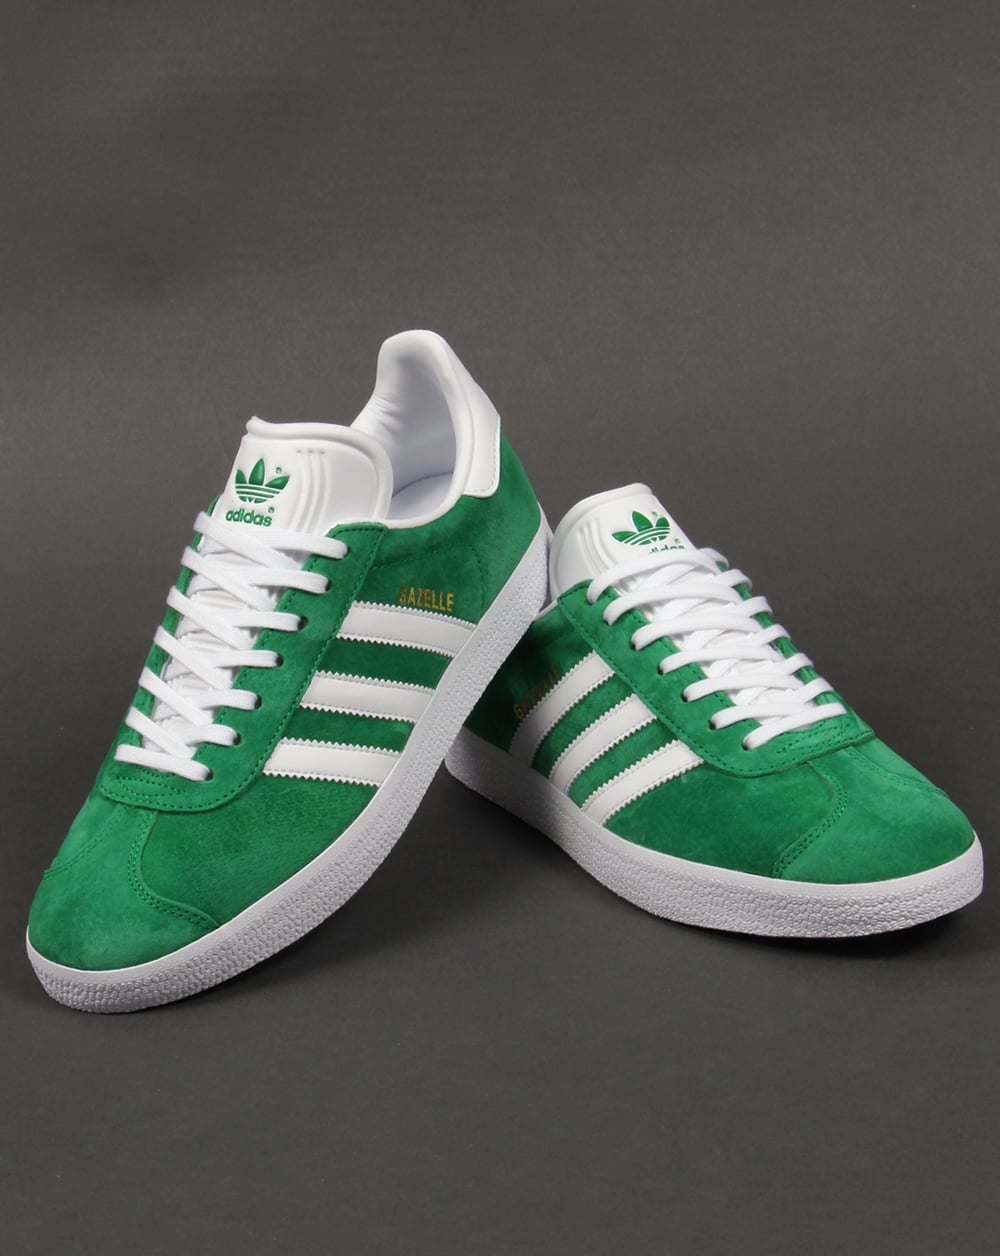 adidas Gazelle 90s green